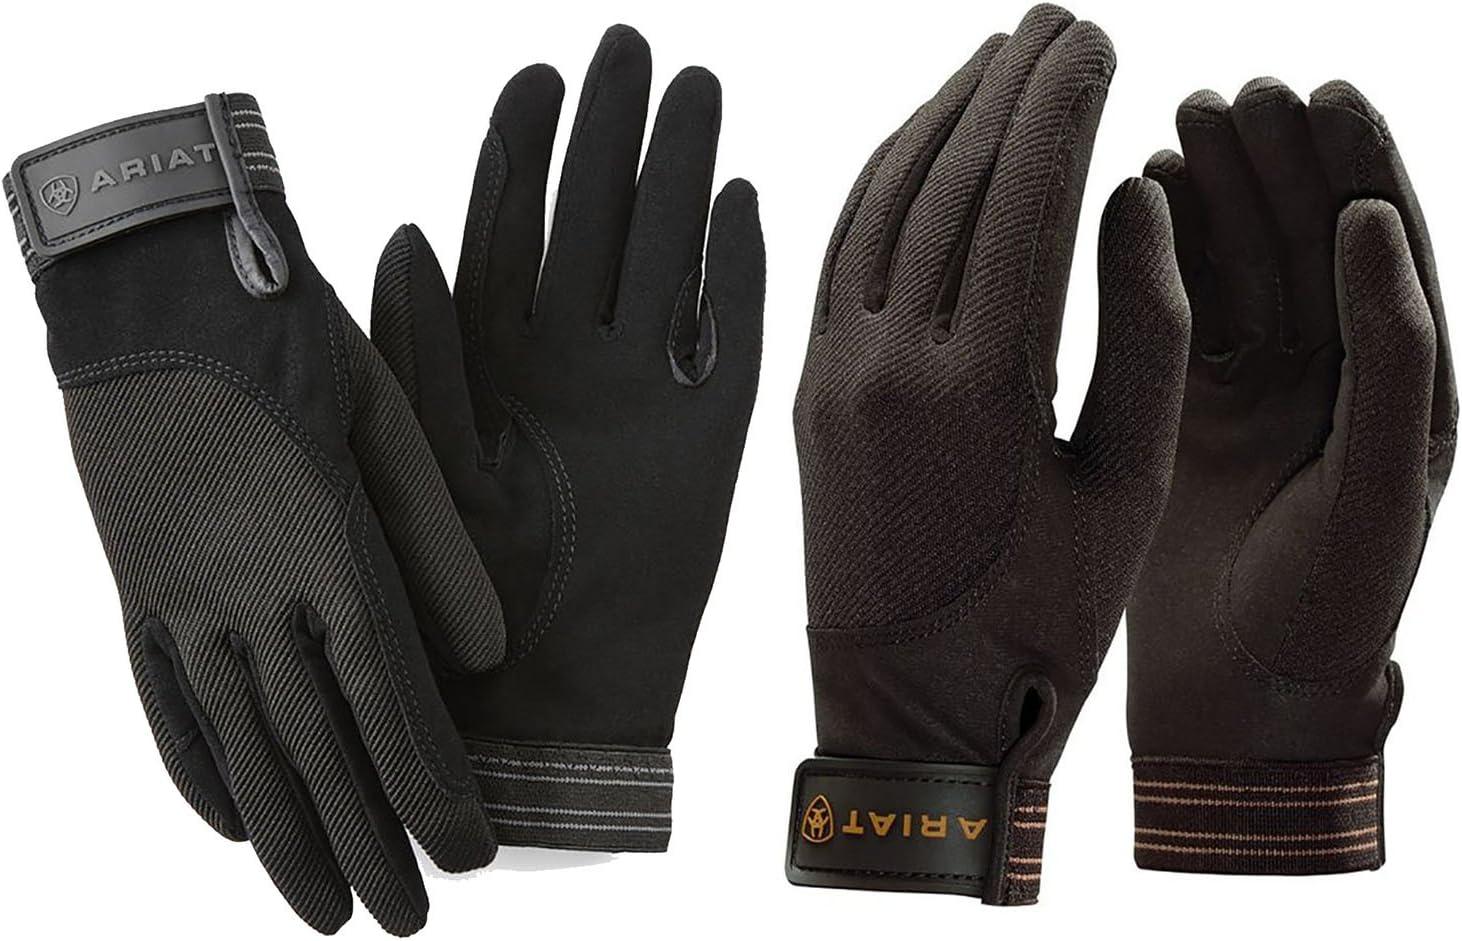 Ariat Insulated Tek Grip Riding Gloves Black